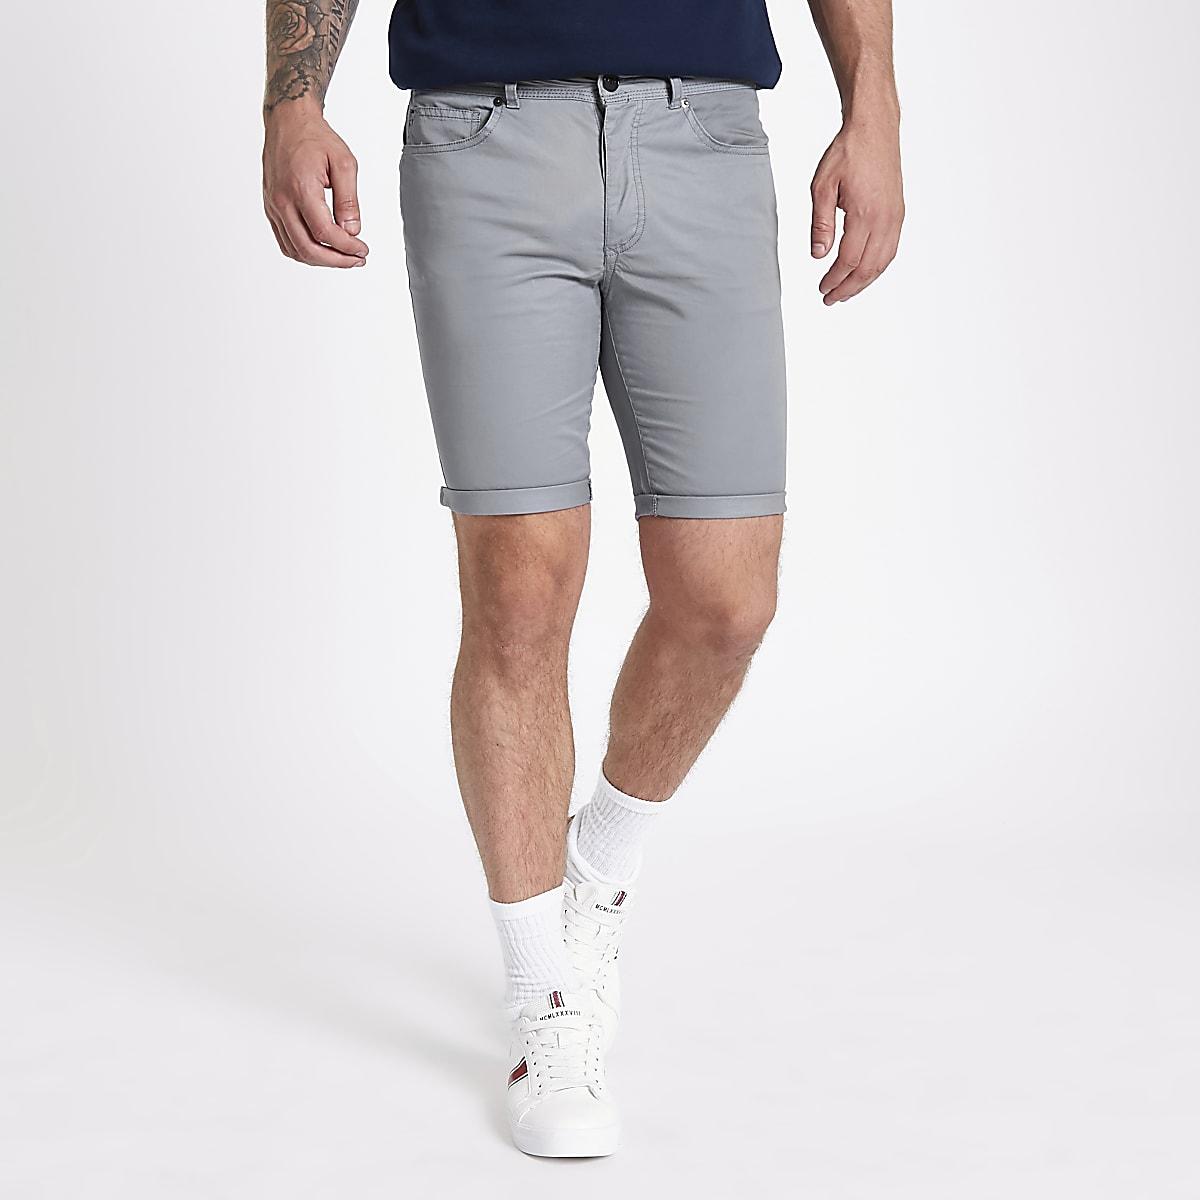 Grey skinny fit shorts